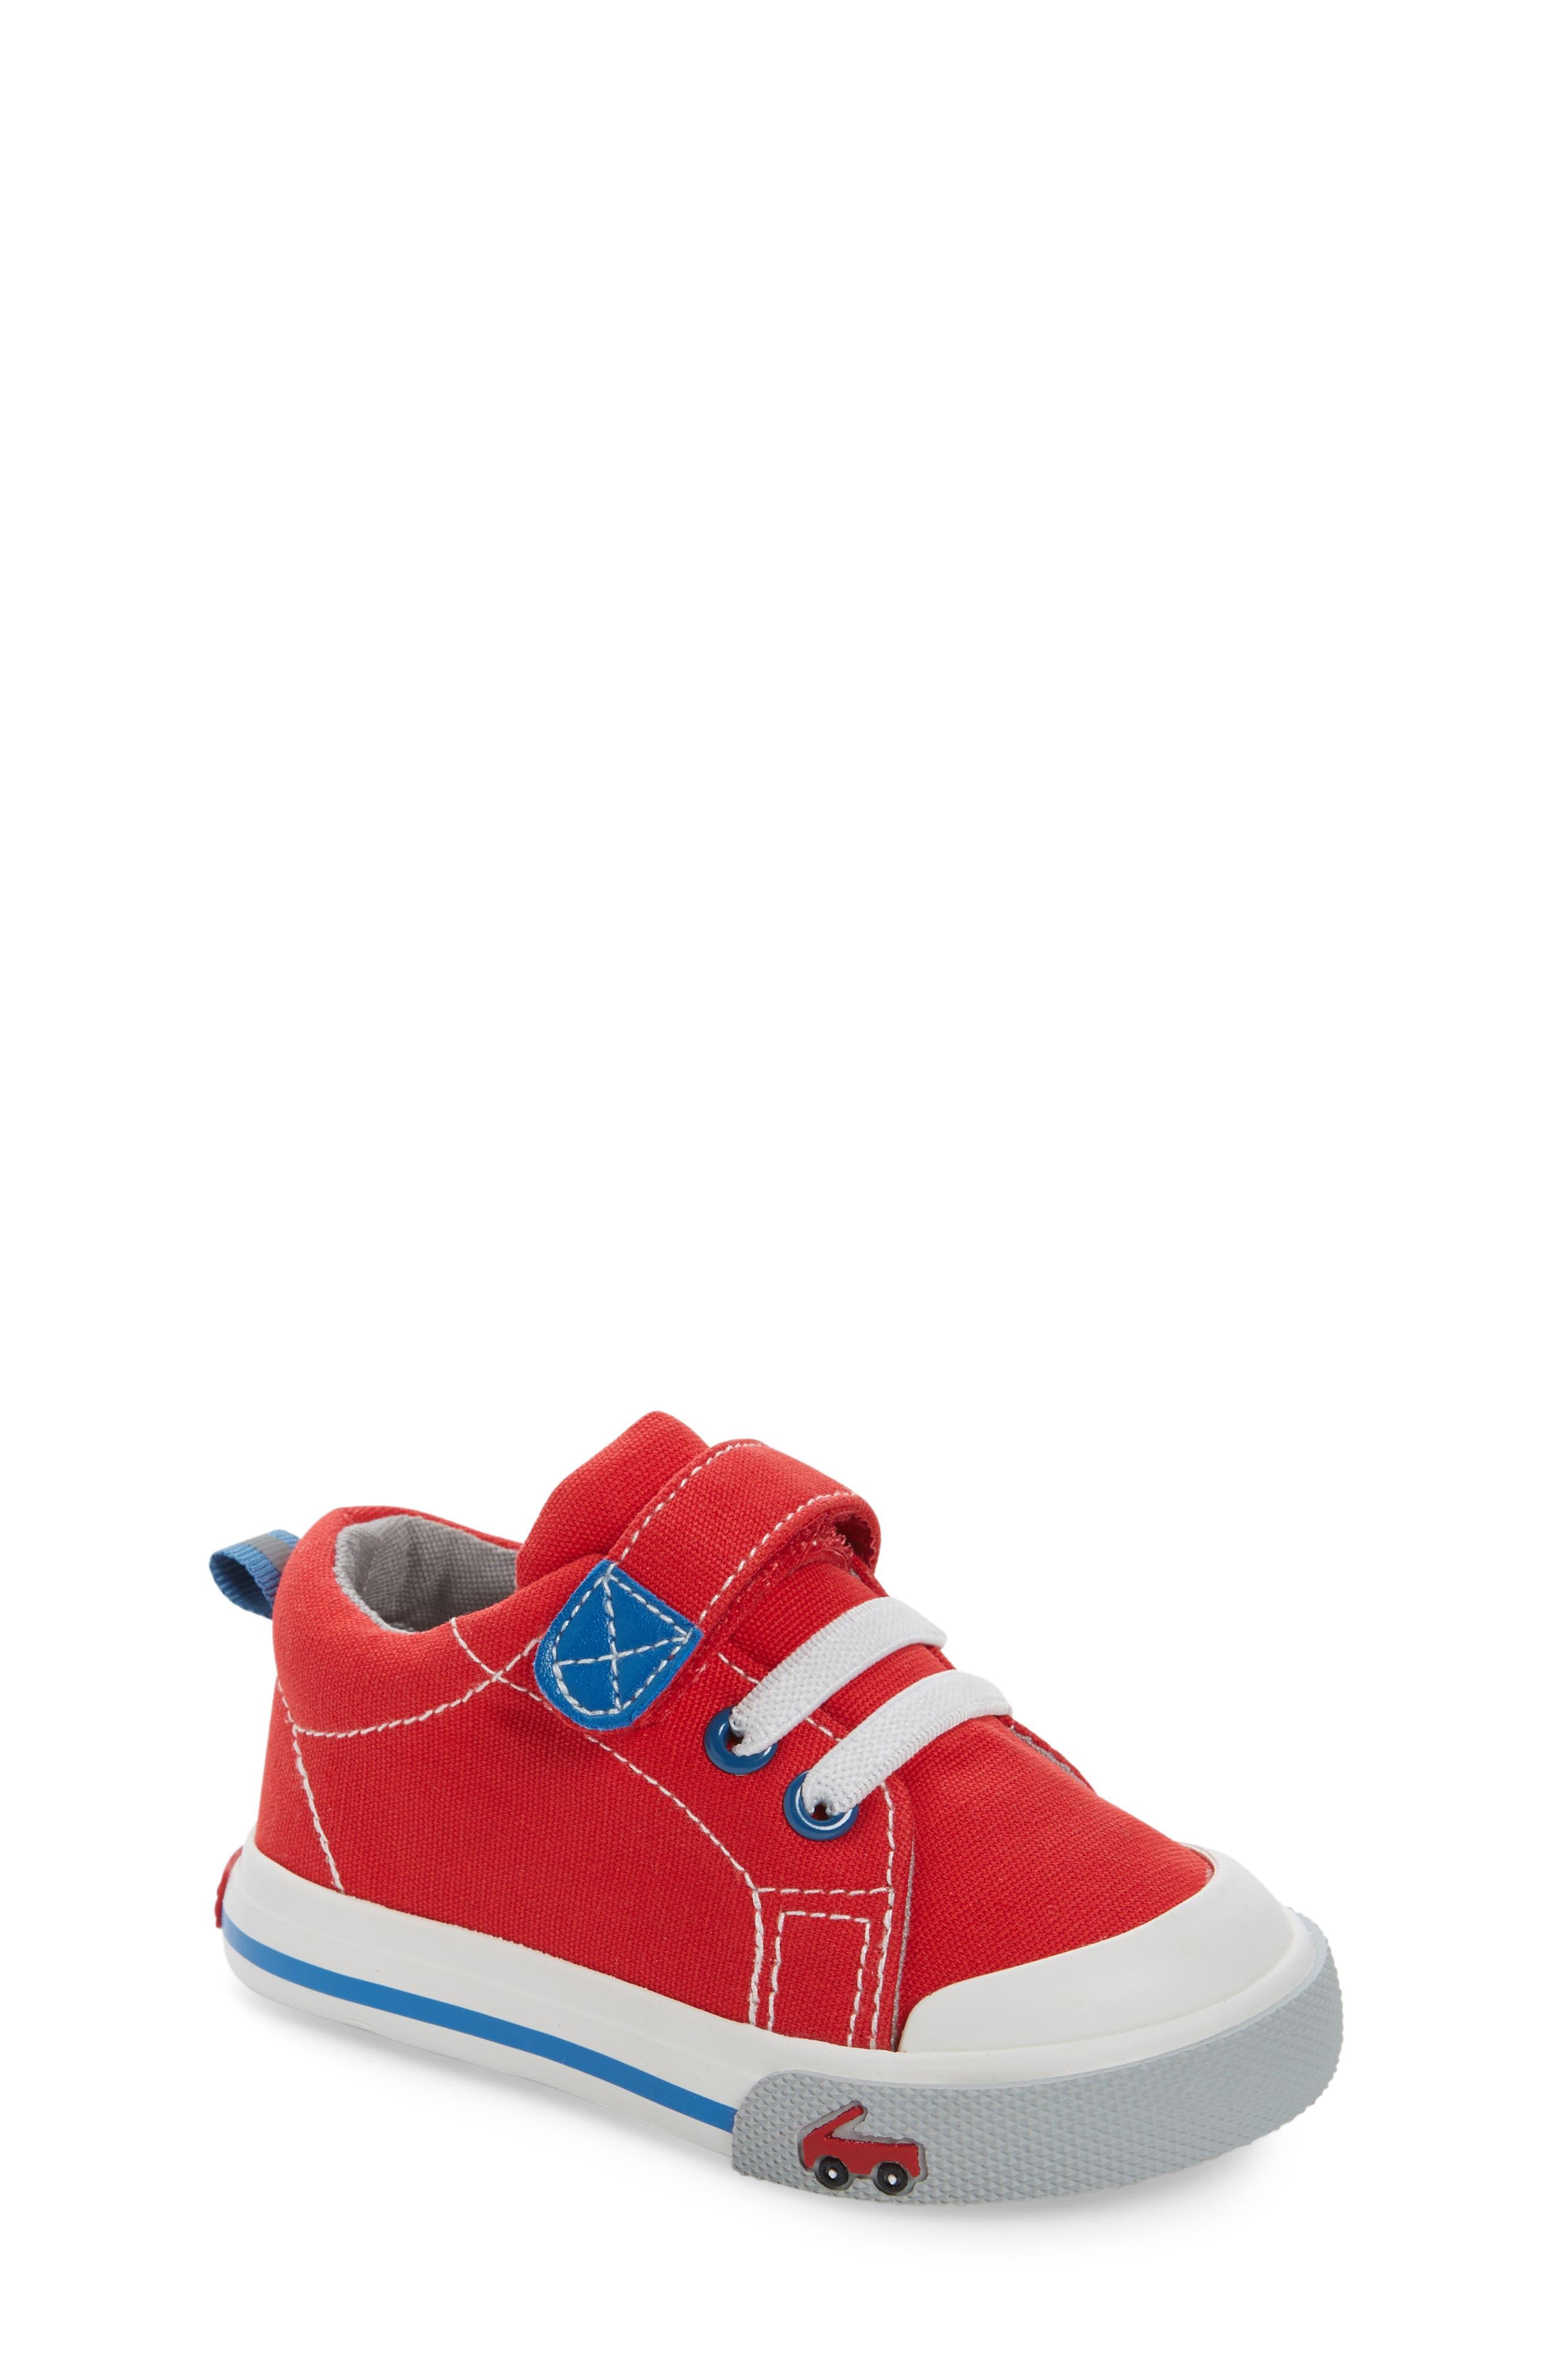 See Kai Run | Stevie II Sneaker